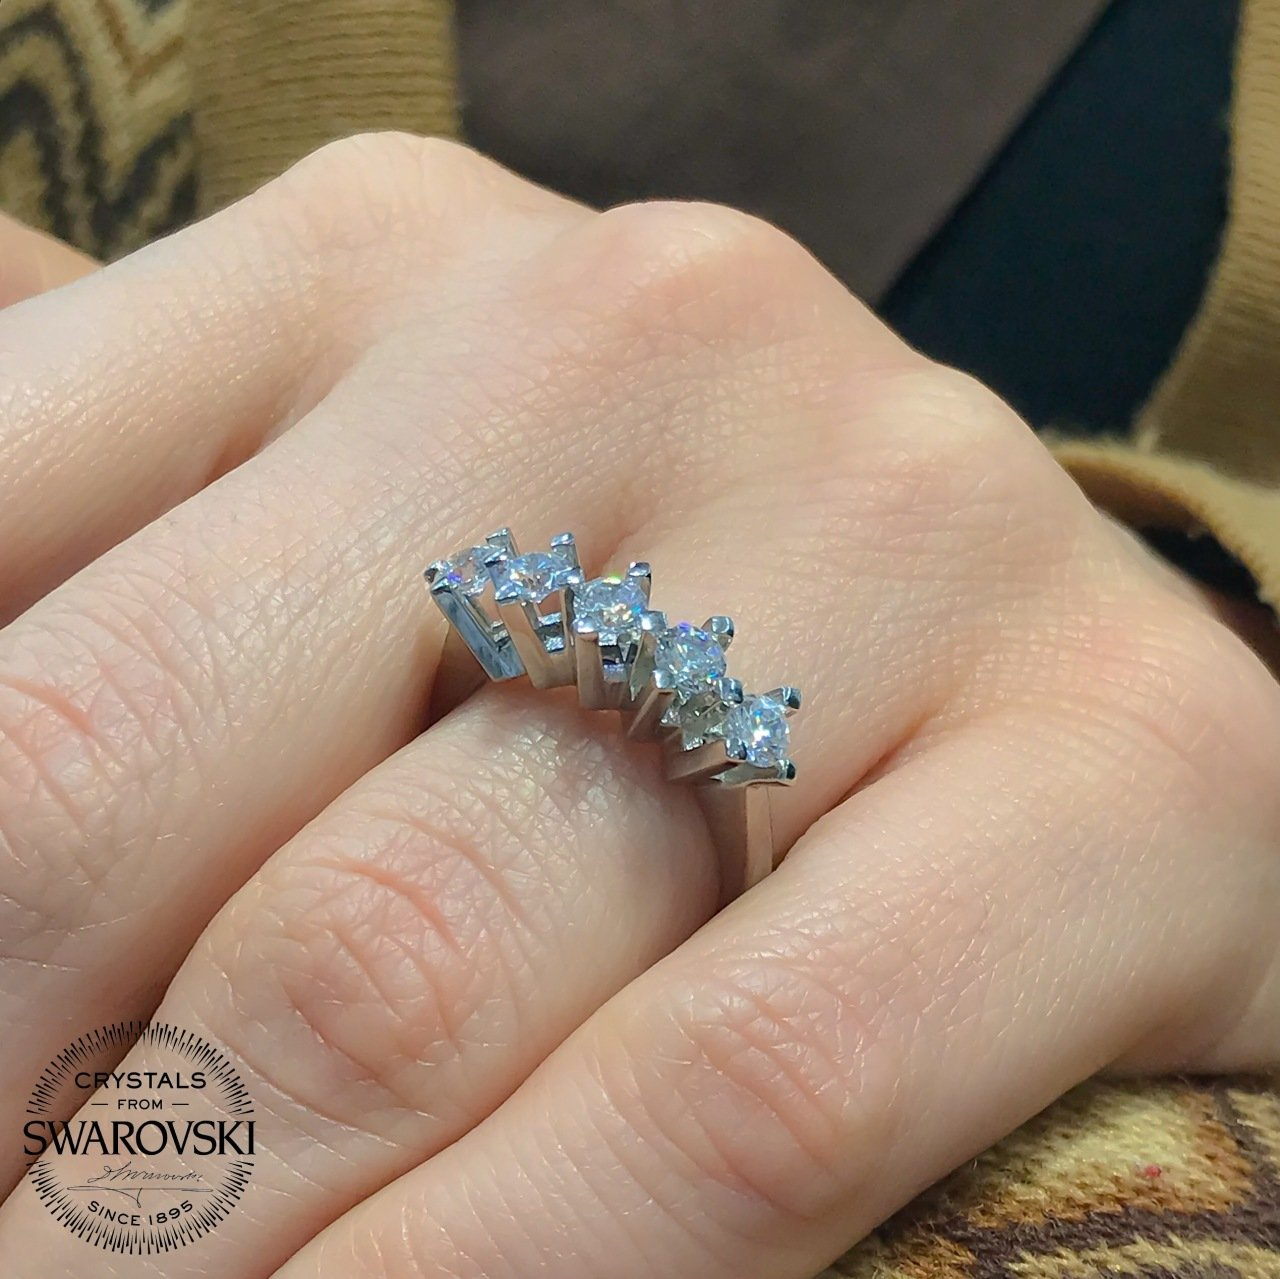 New Original Swarovski Dibs Princess Petals sterling Silver Ring